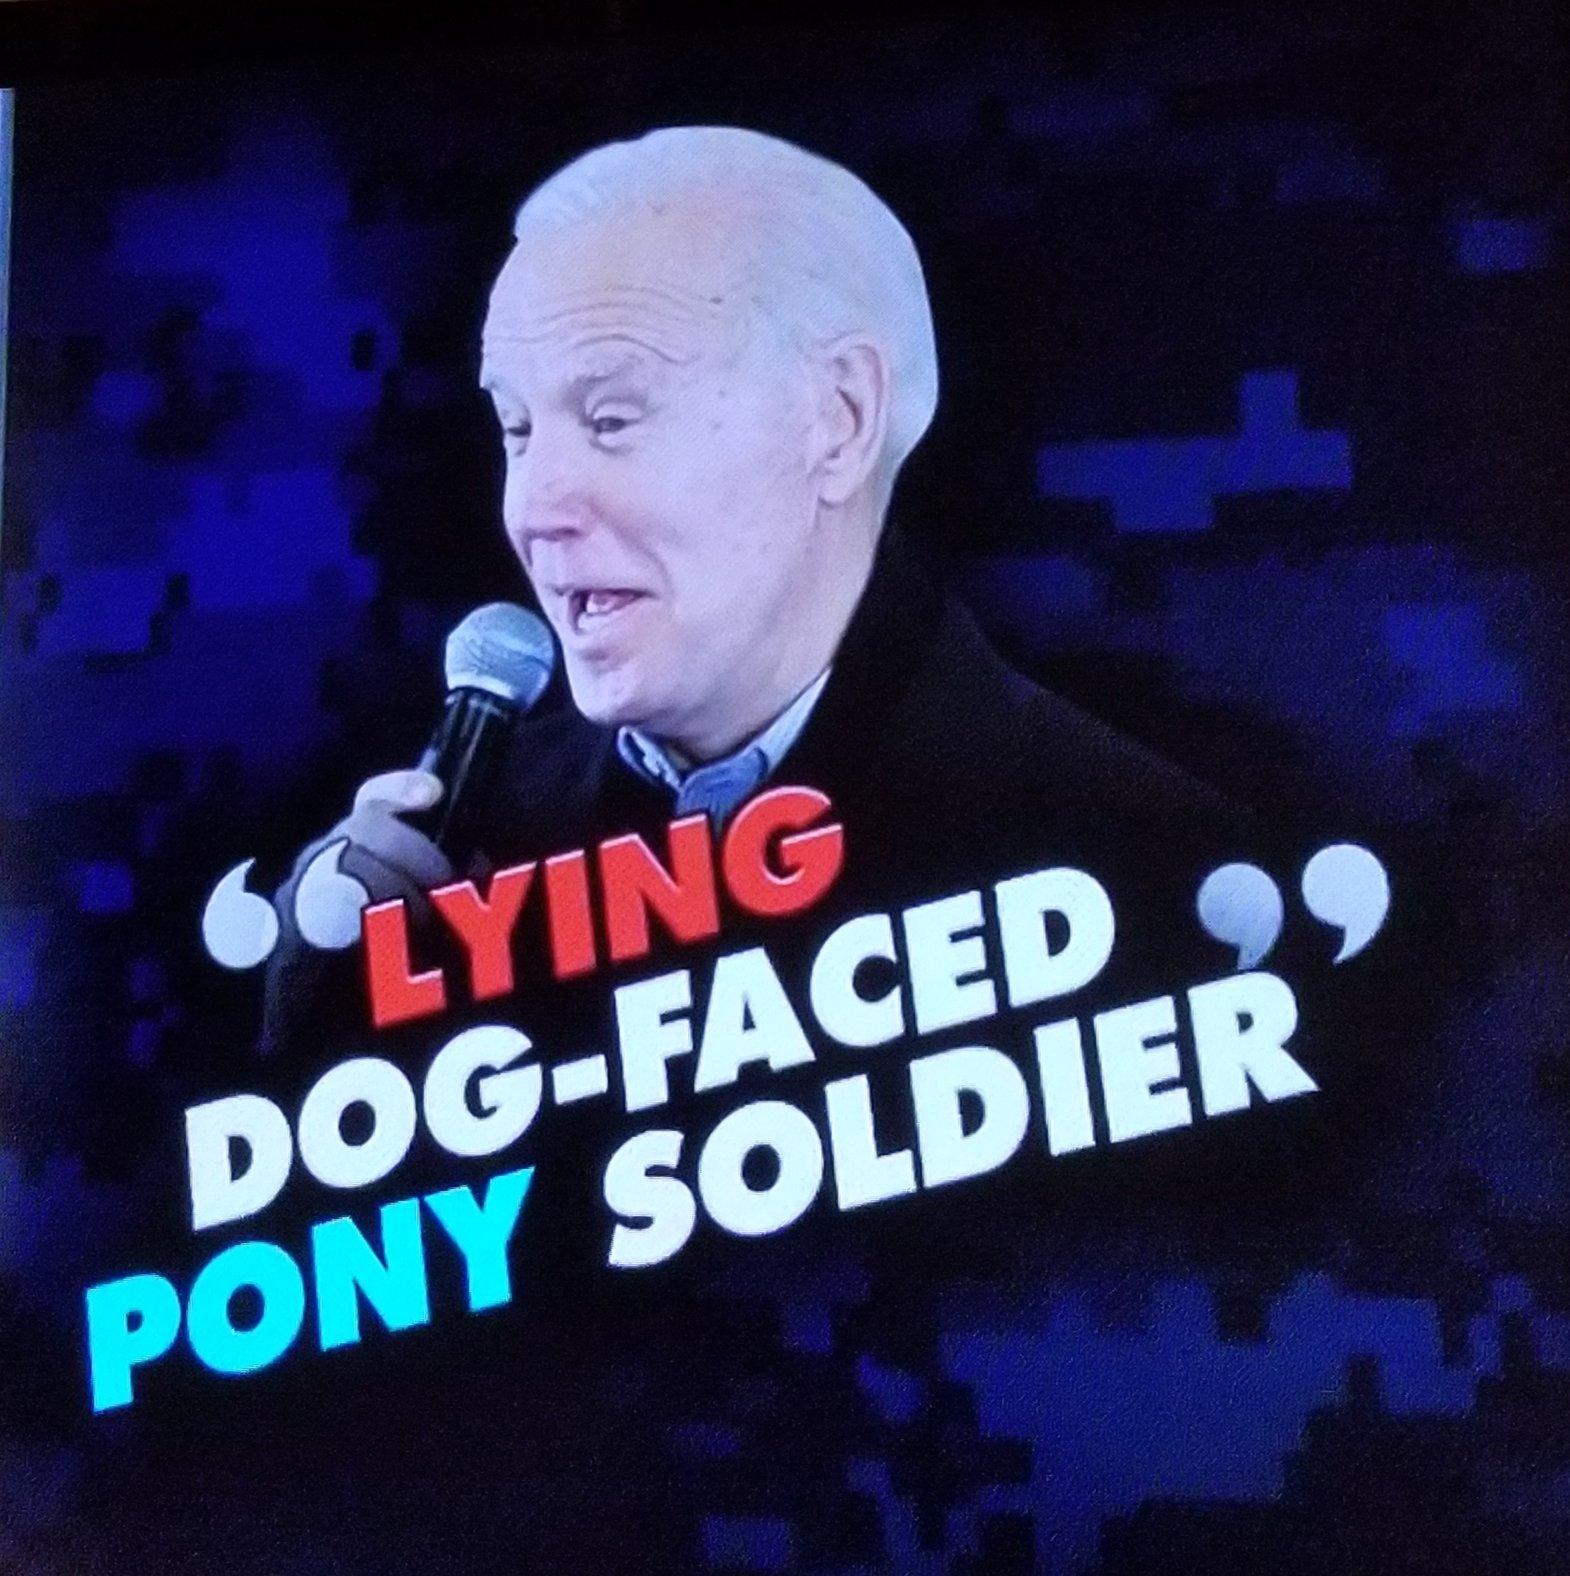 Biden pony soldier quote